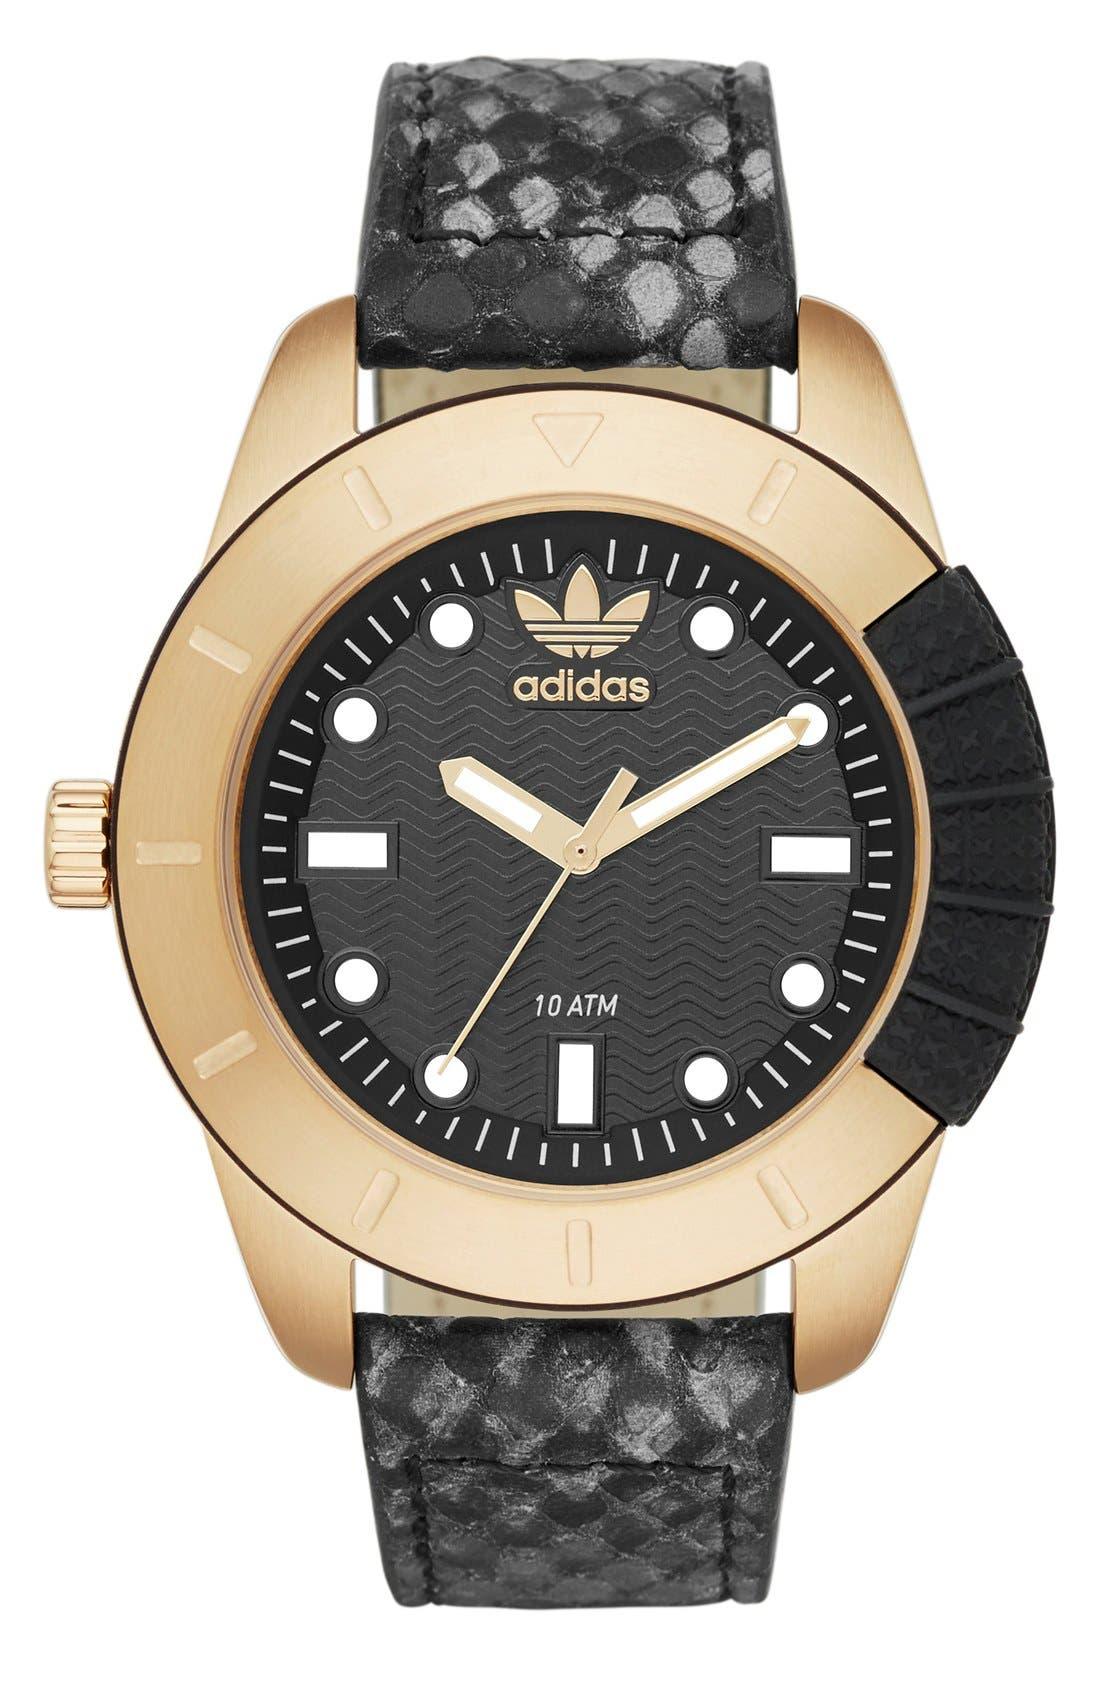 Main Image - adidas Originals 'ADH-1969' Leather Strap Watch, 41mm